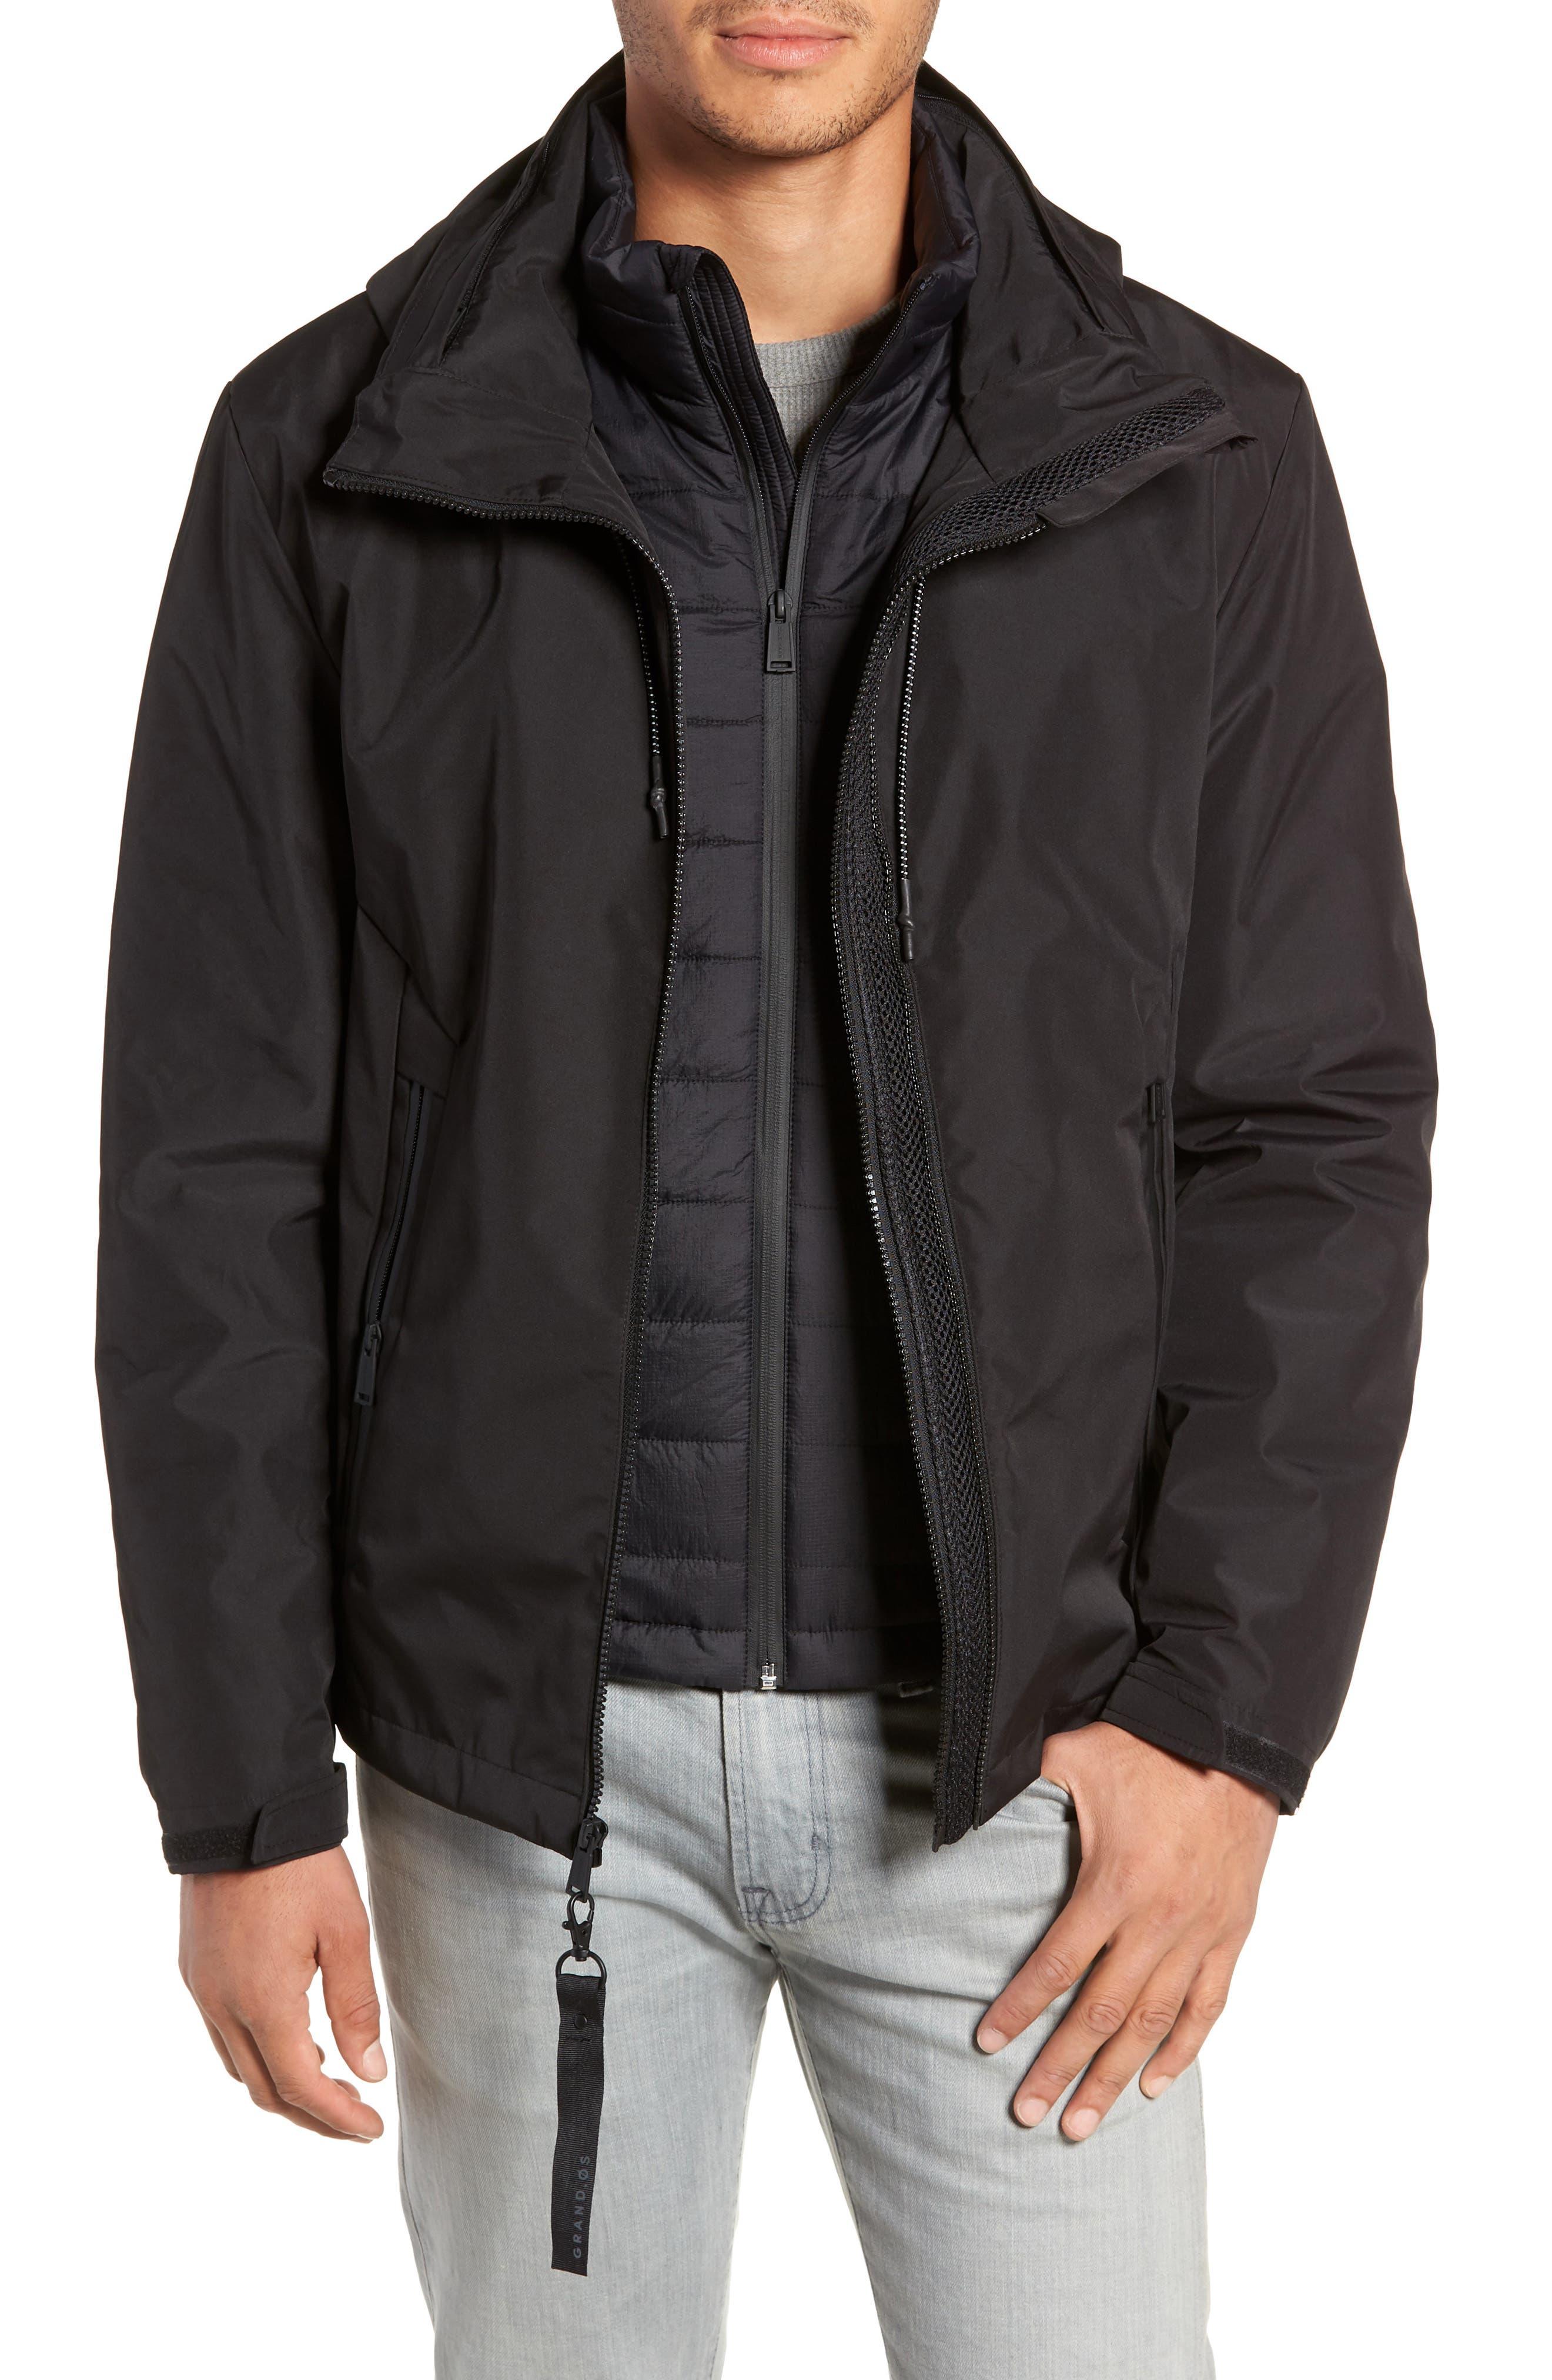 3-in-1 Rain Jacket,                             Main thumbnail 1, color,                             BLACK